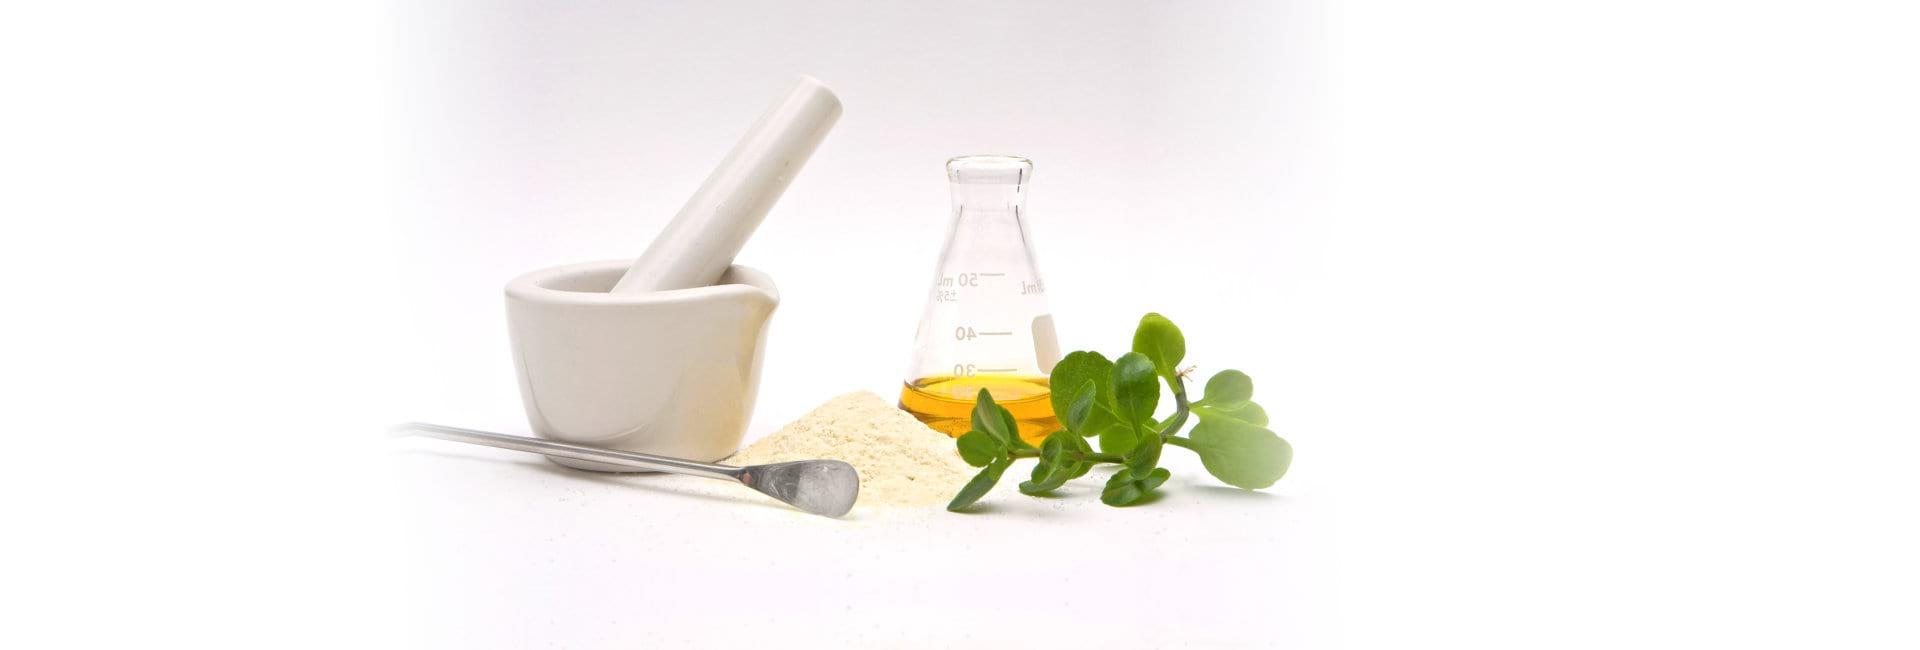 organic medicine compounding